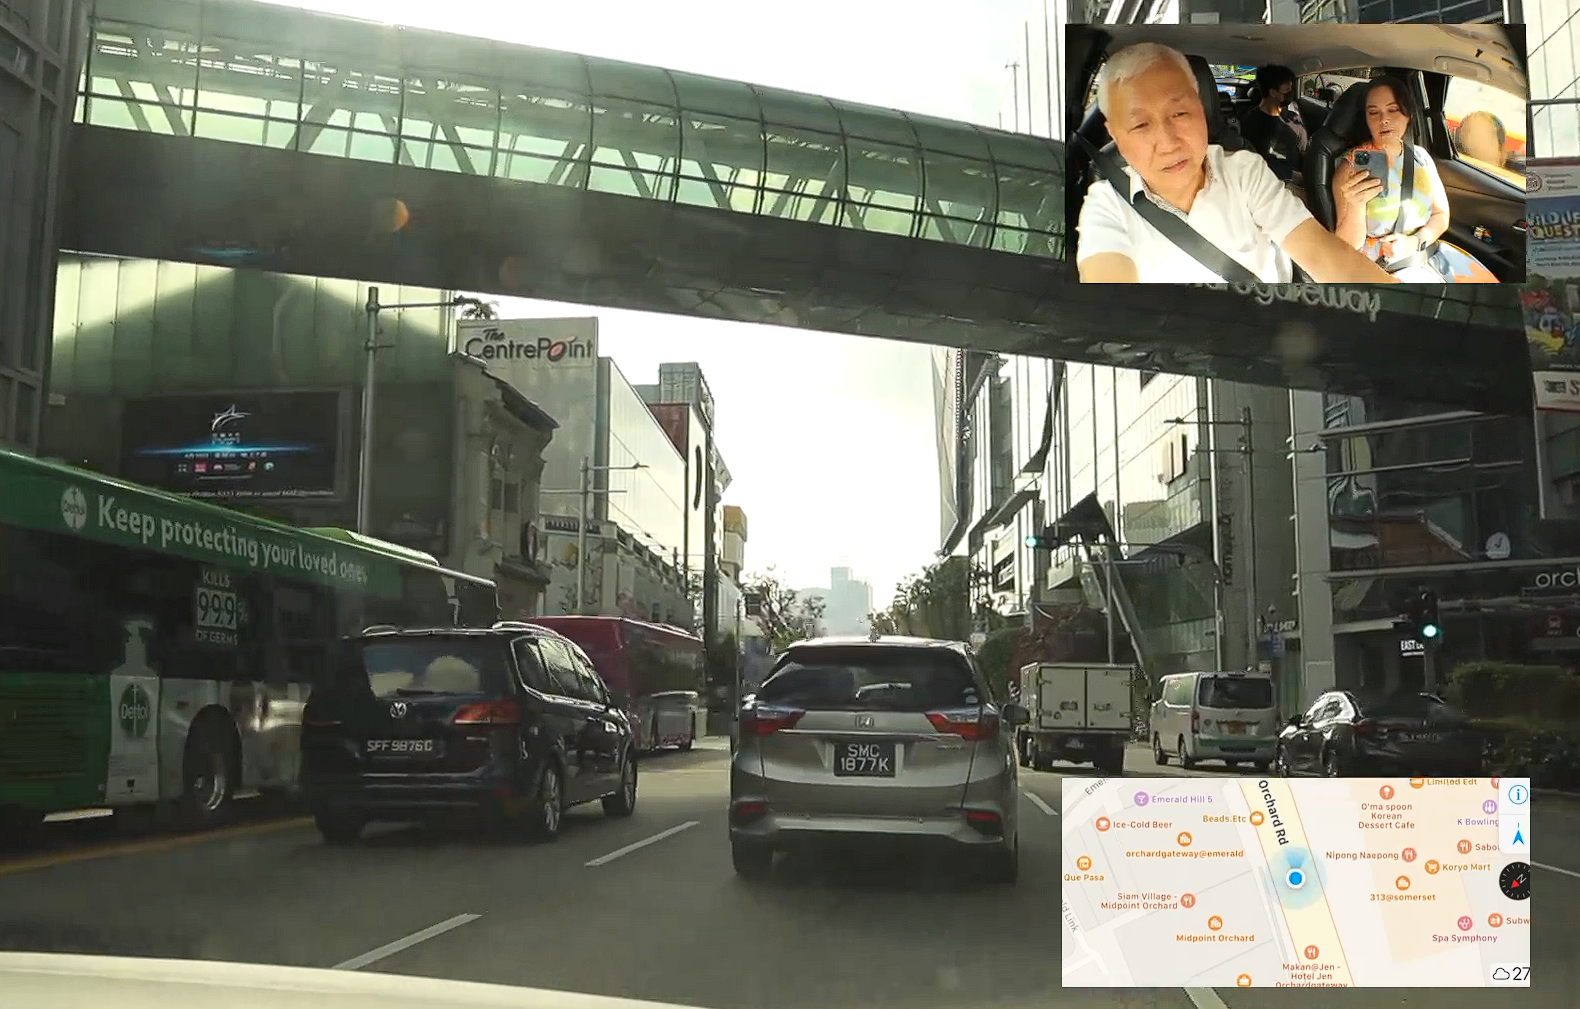 Власти Сингапура запустили на Twitch стрим экскурсии по городу на такси